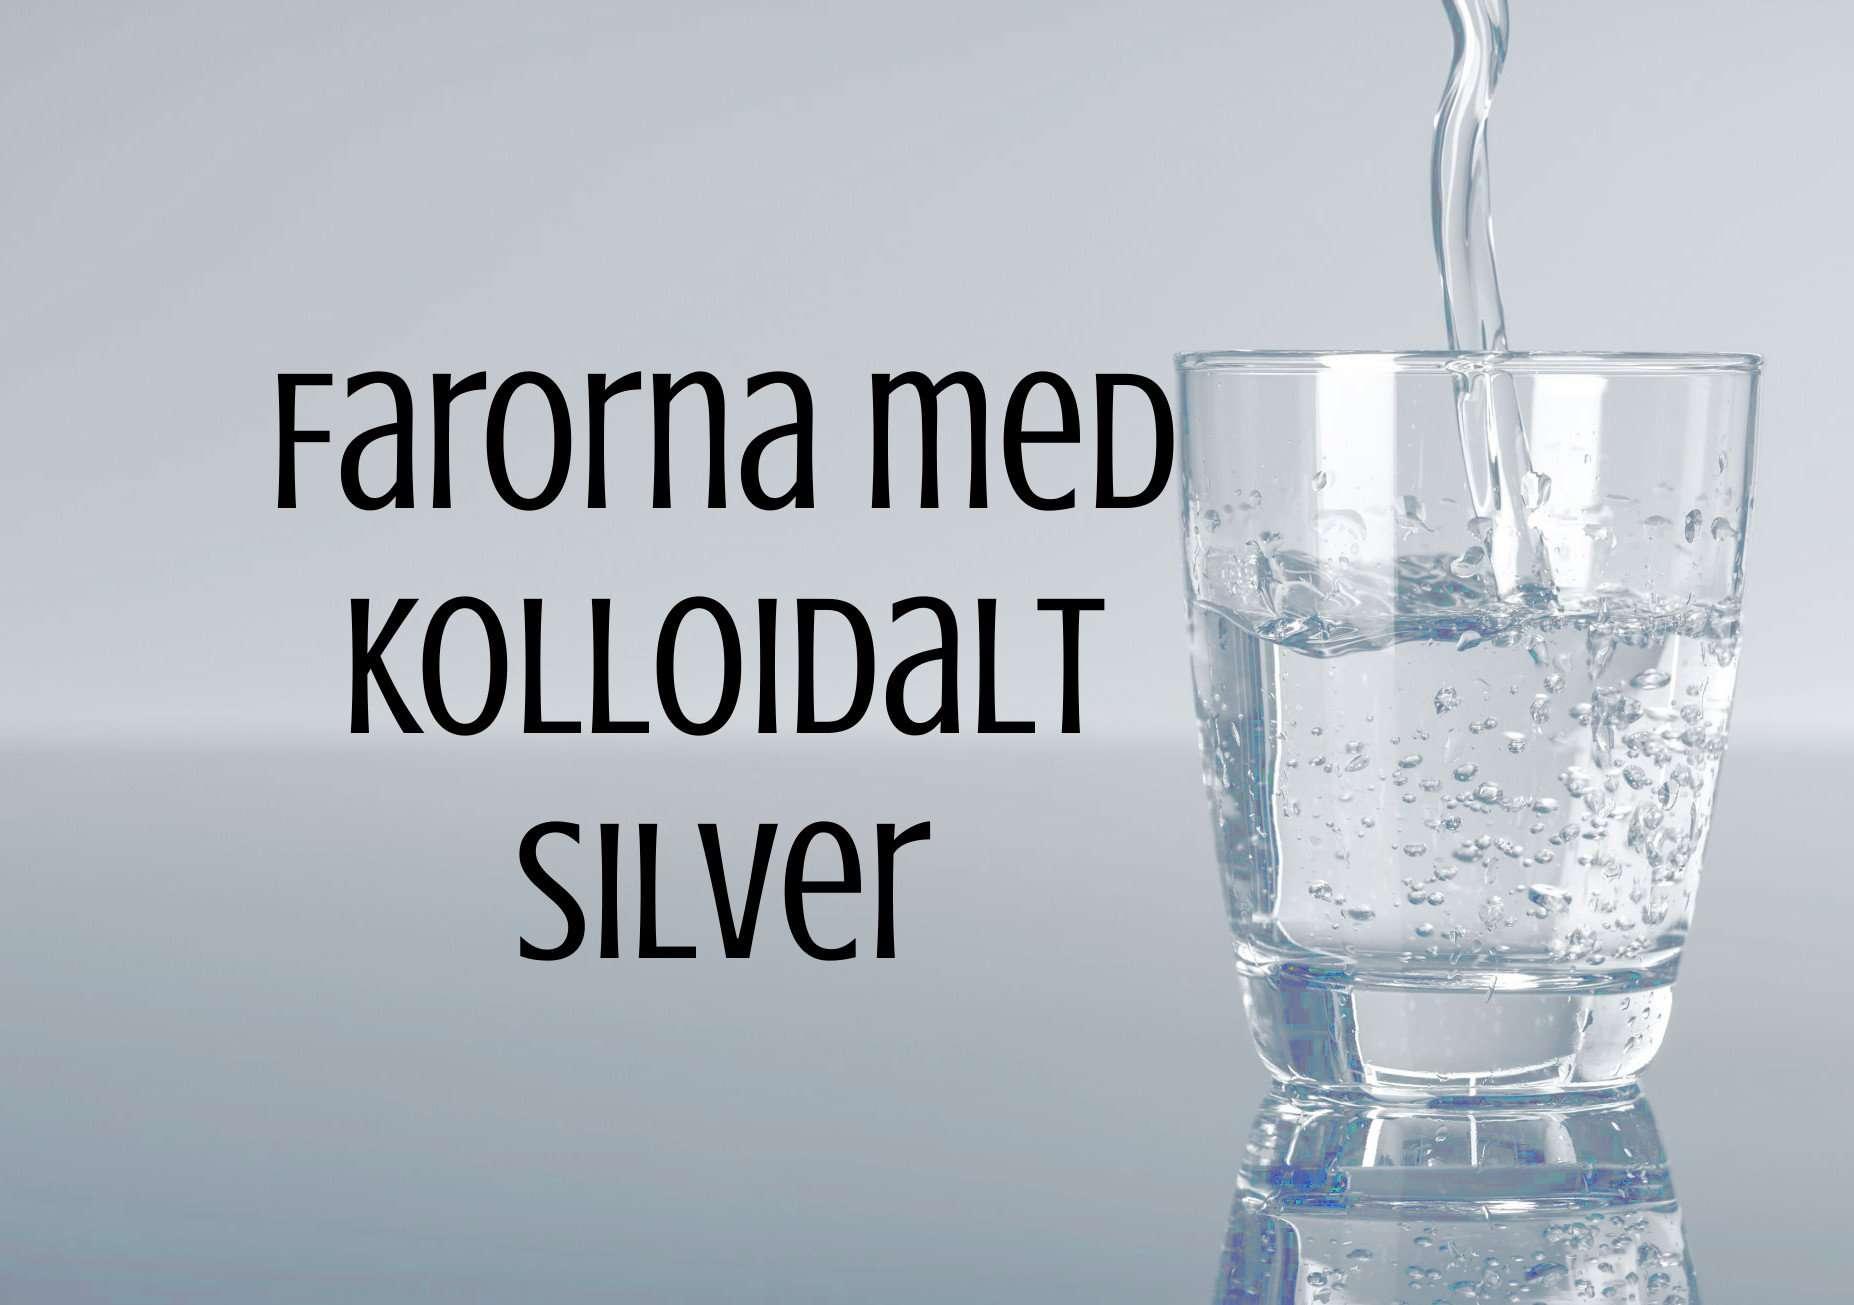 kolloidalt silver